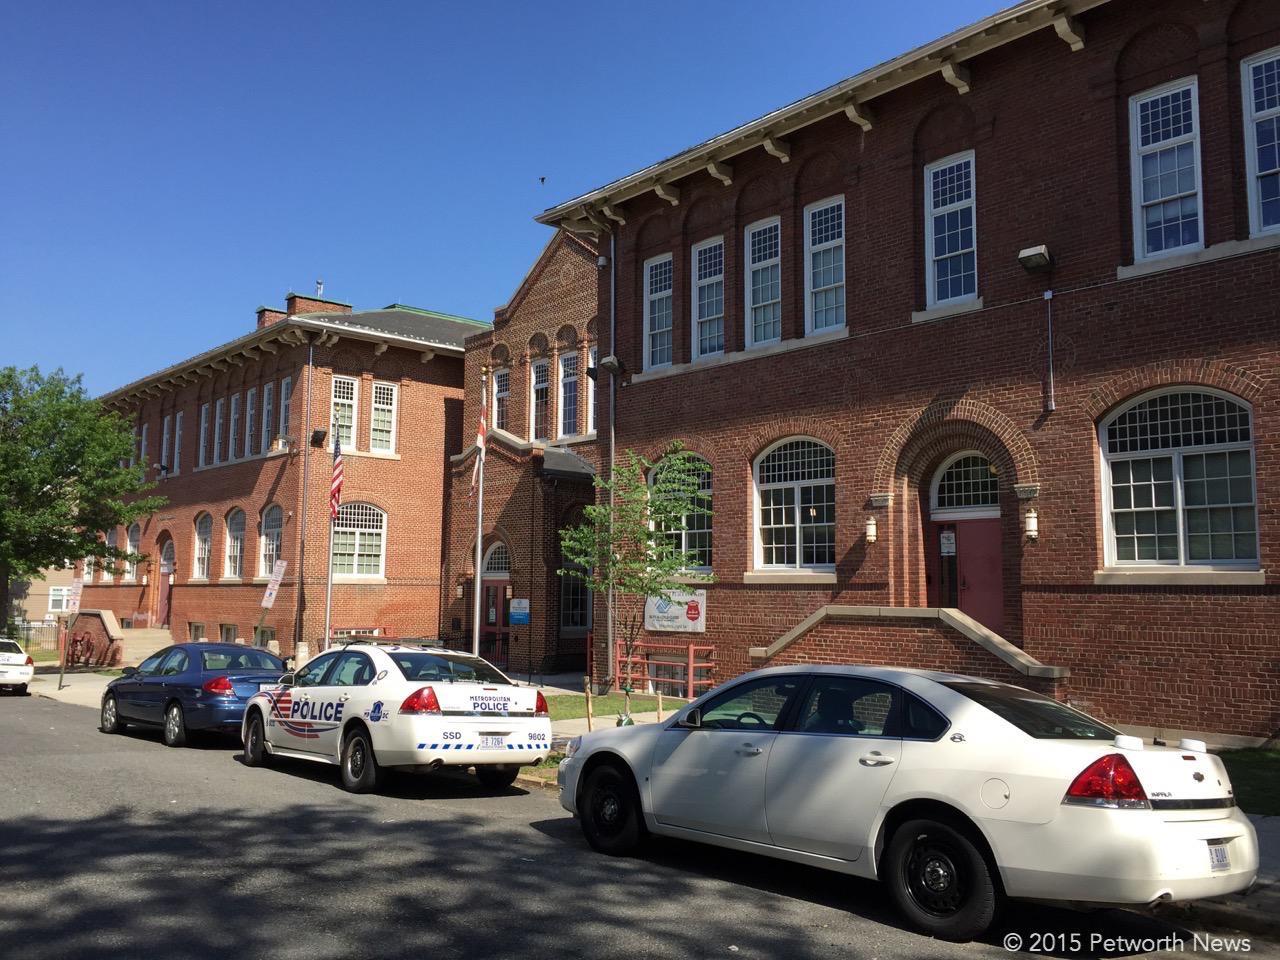 Patrol Services Building (801 Shepherd St NW)